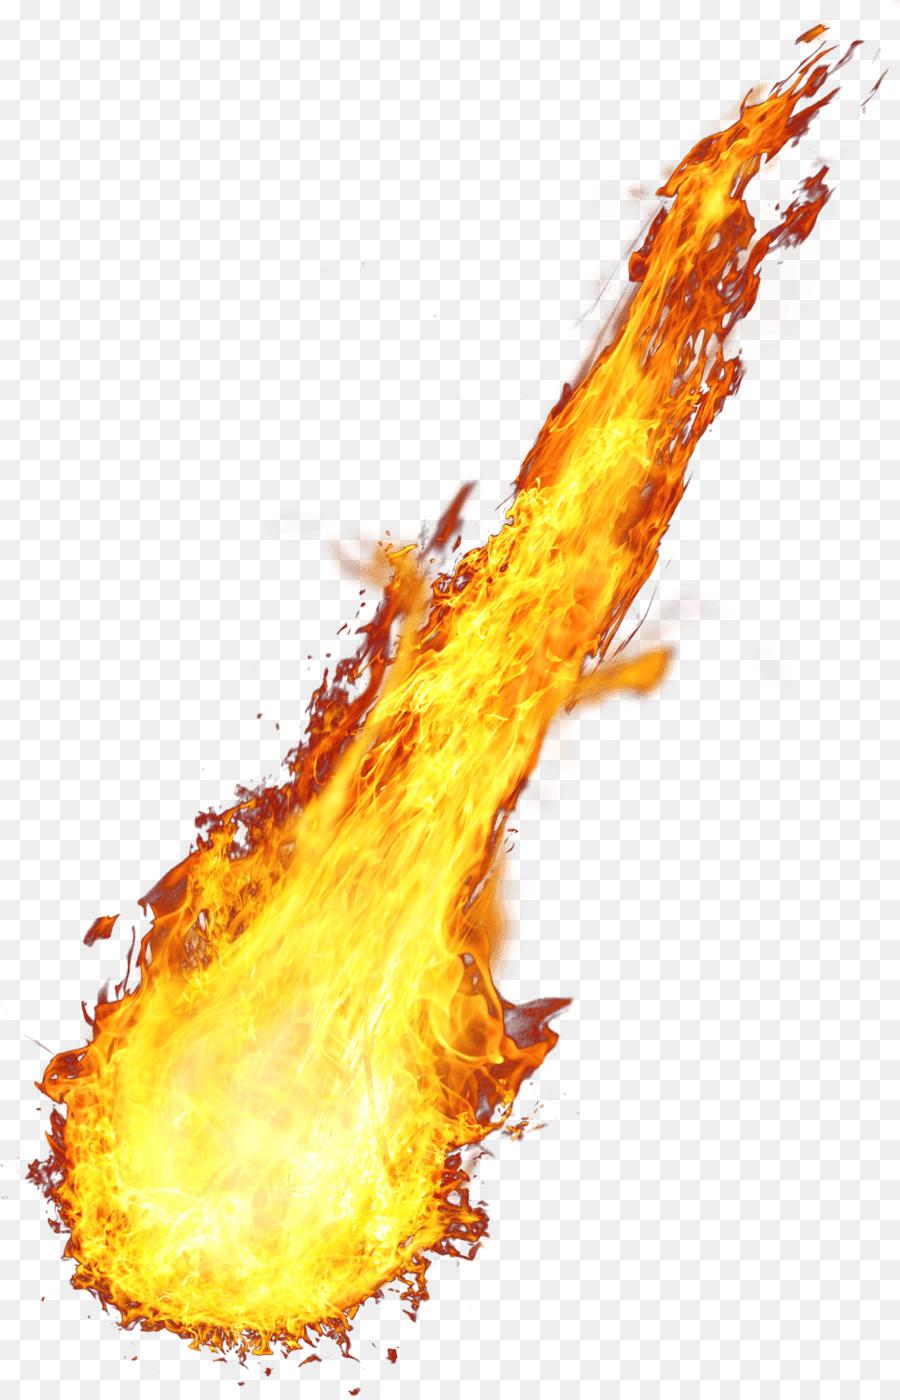 Asteroid clipart yellow flame. Meteoroid meteorite clip art